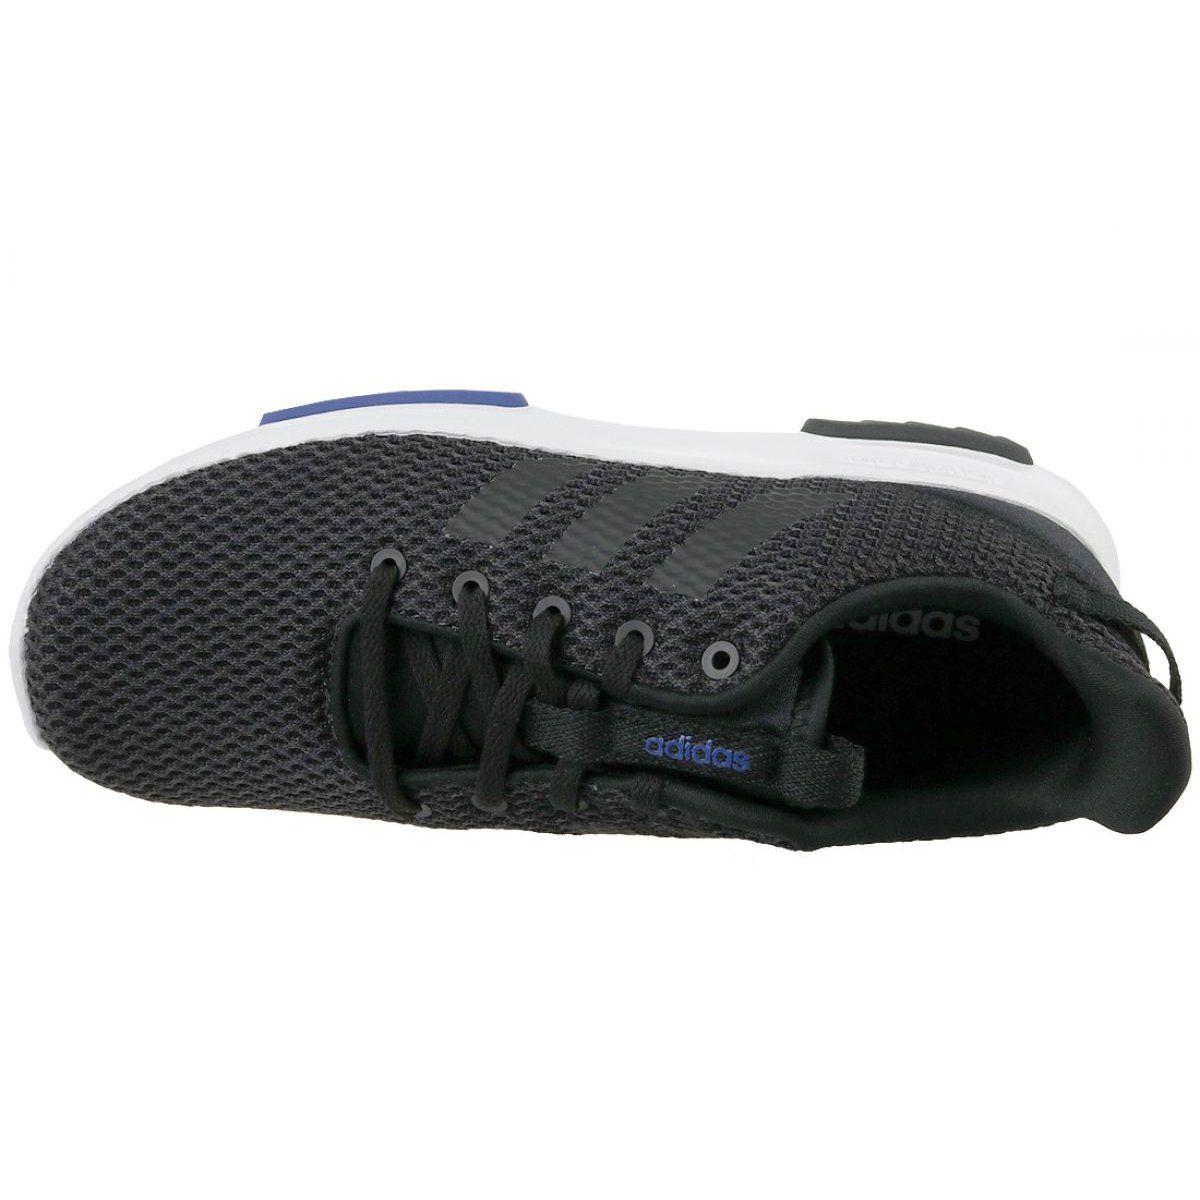 Adidas Cloudfoam Racer Tr K Jr Db1300 Shoes Black Sports Shoes Adidas Adidas Cloudfoam Black Shoes